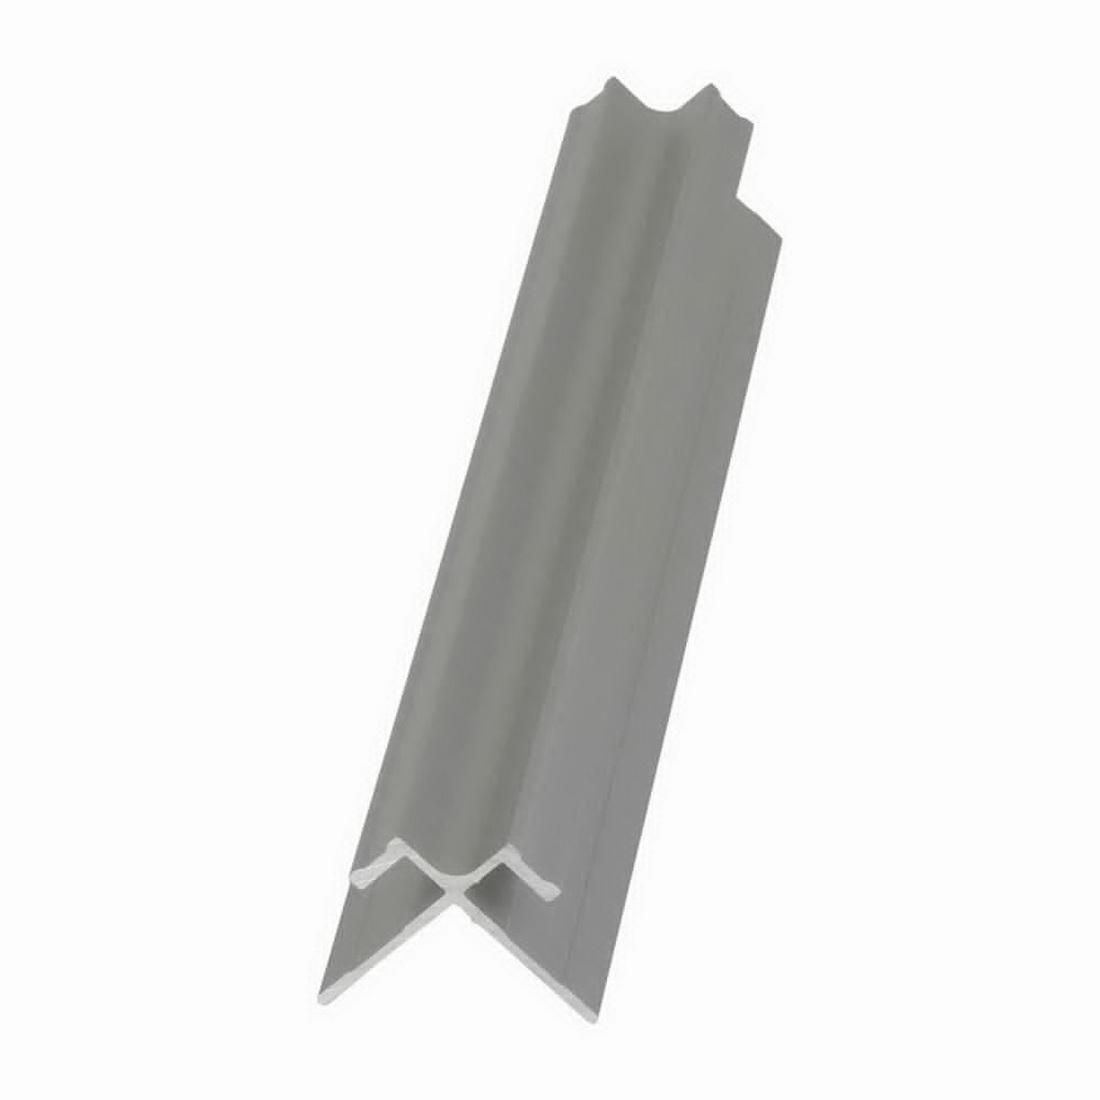 HardieGlaze 4.5 x 2700mm Aluminium External Corner